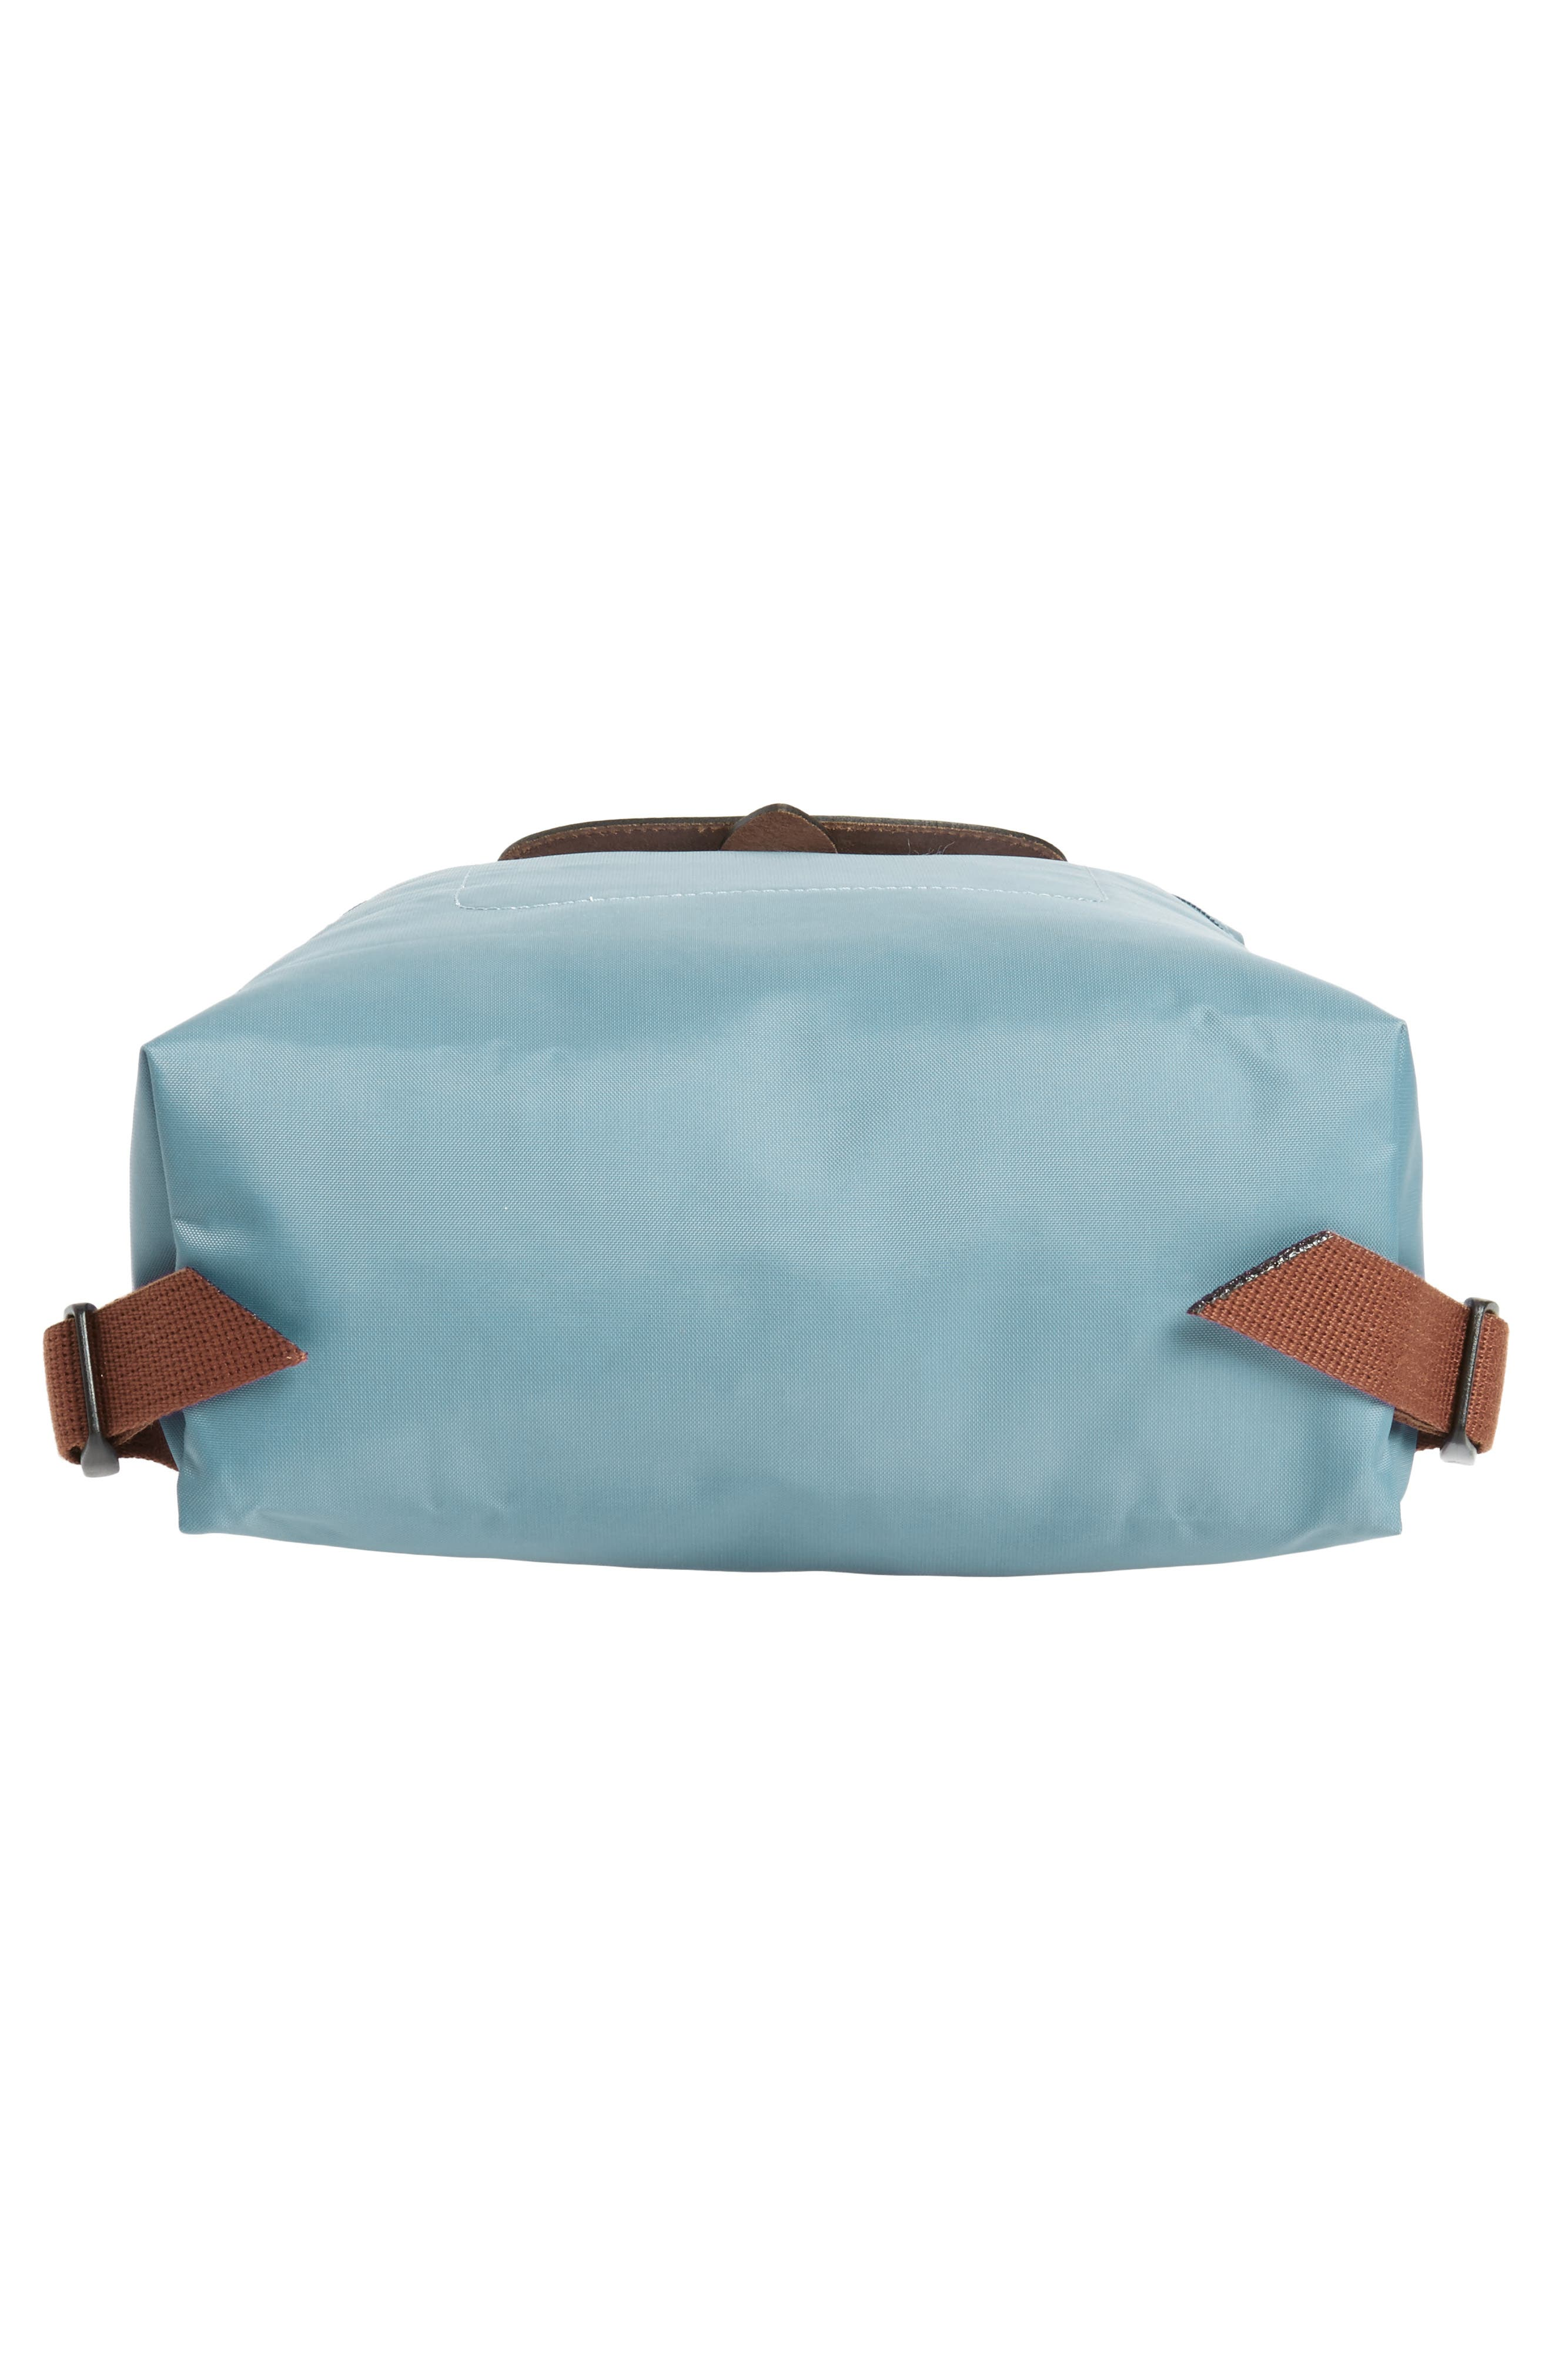 'Le Pliage' Backpack,                             Alternate thumbnail 6, color,                             ARTICO